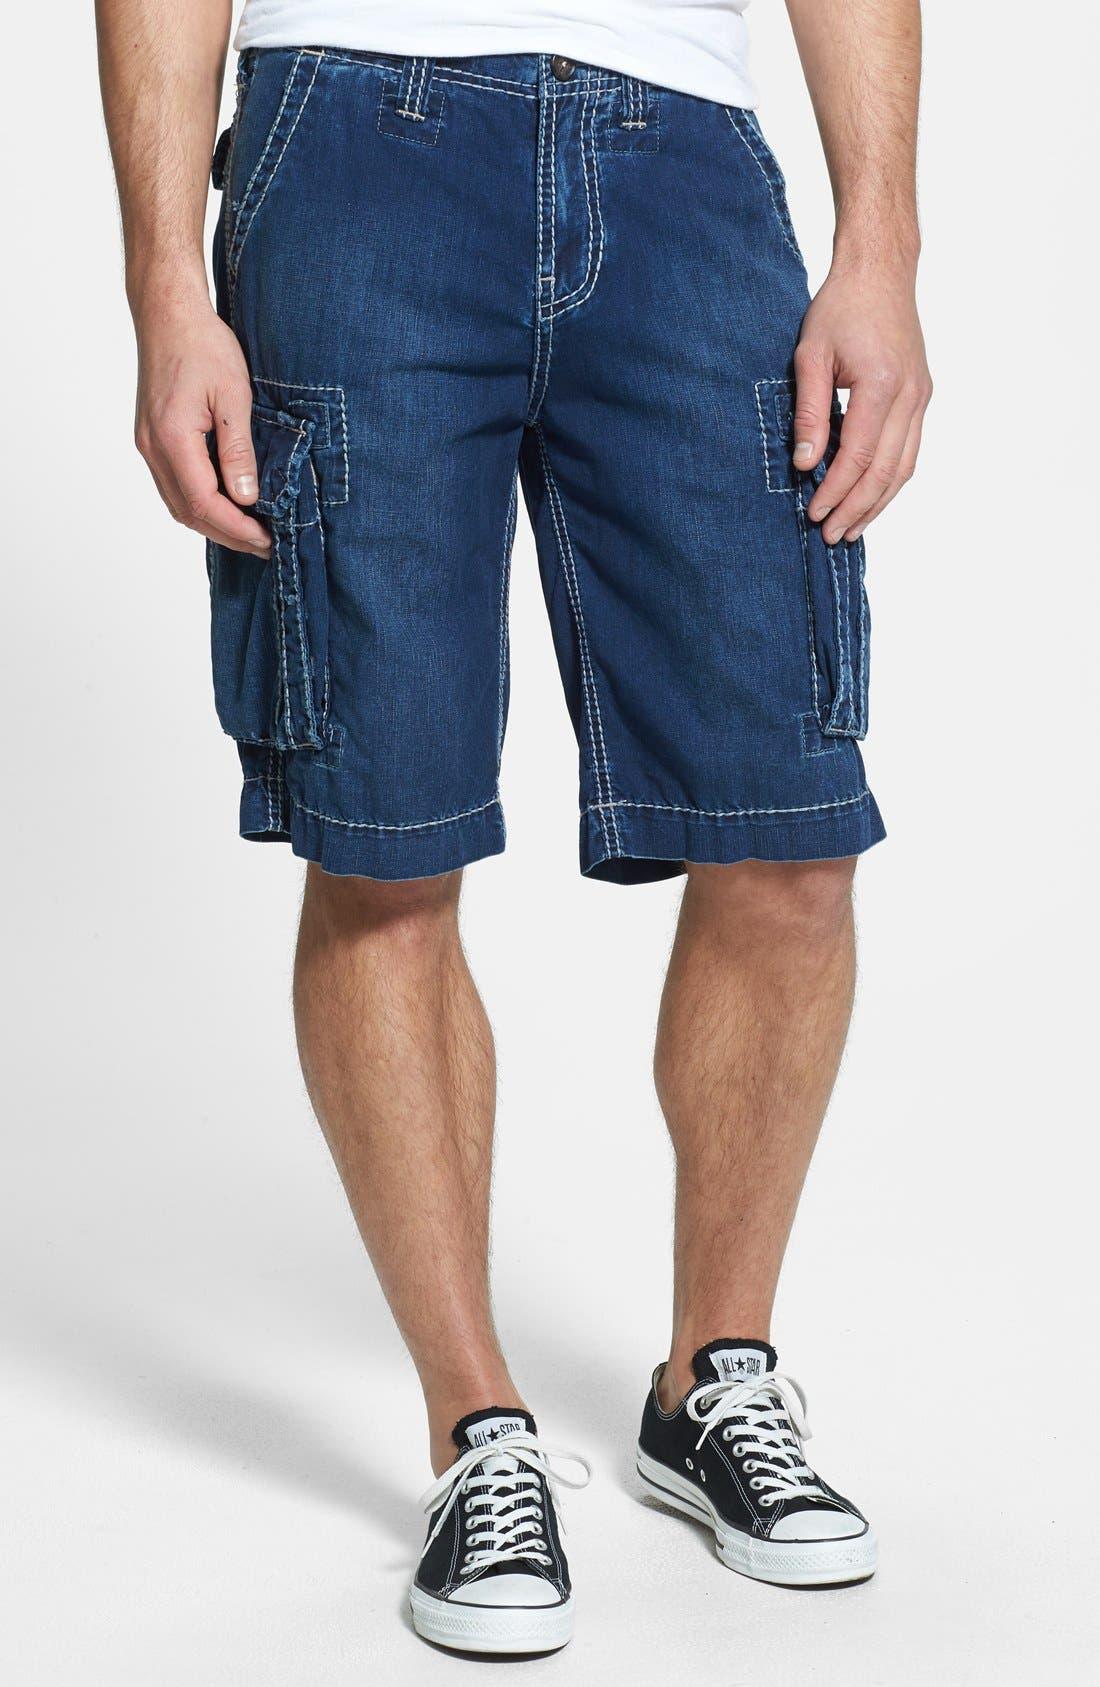 Main Image - True Religion Brand Jeans 'Commander - Big T' Denim Cargo Shorts